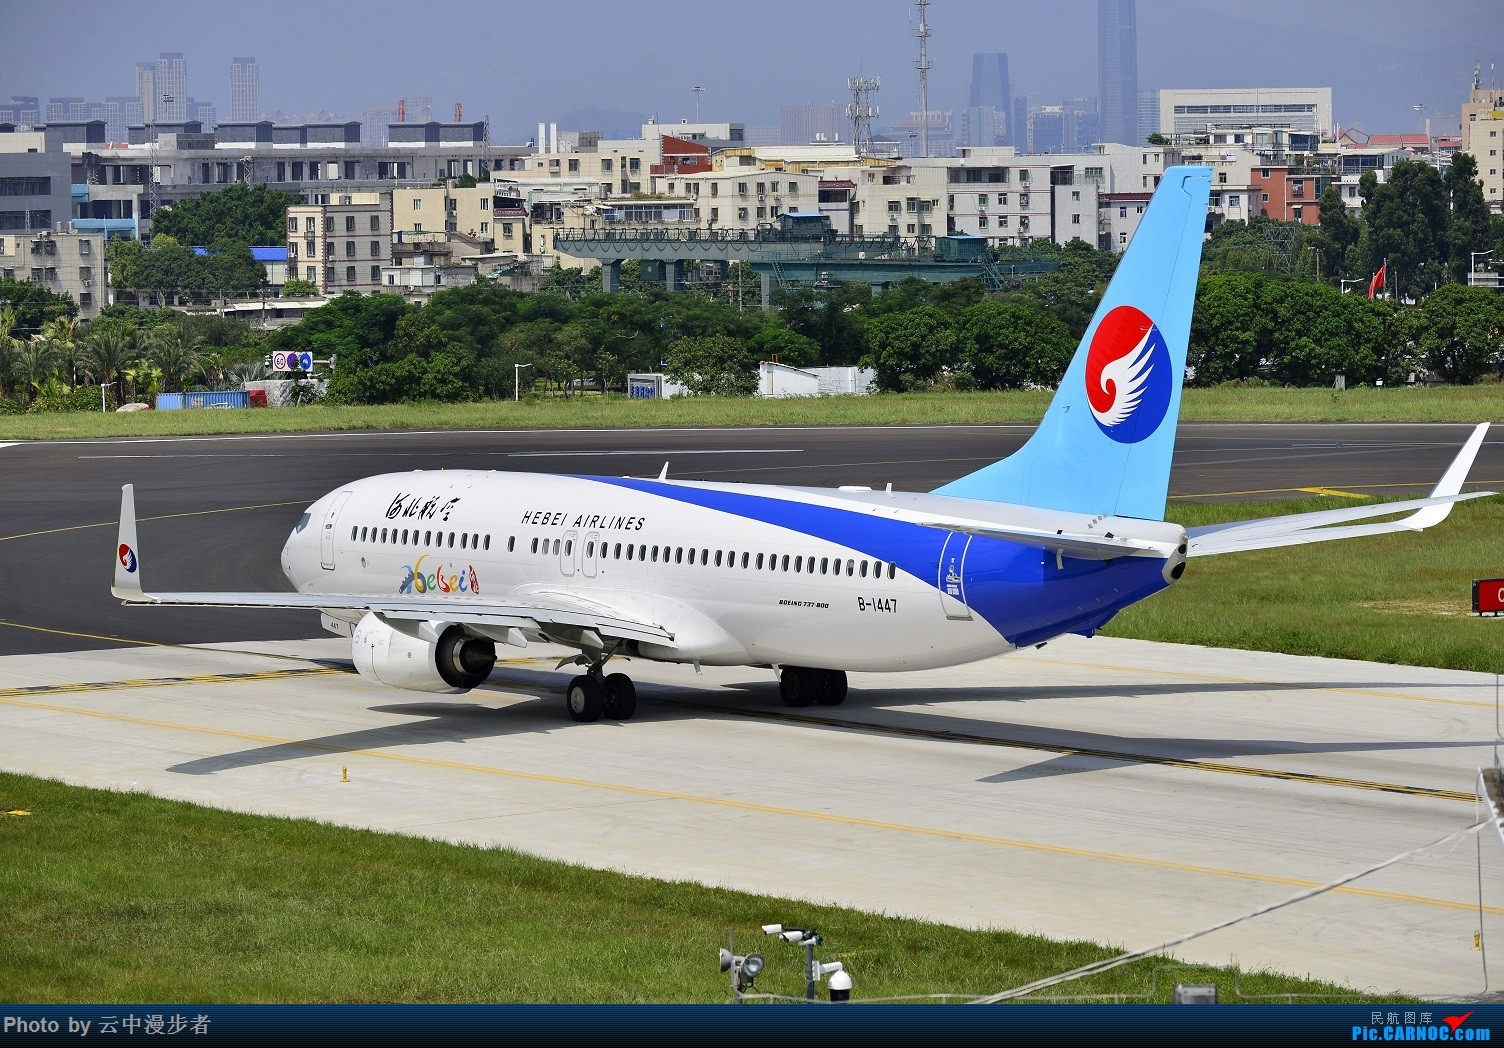 Re:[原创]双节前狠狠地拍了一天的机 BOEING 737-800 B-1447 中国厦门高崎国际机场